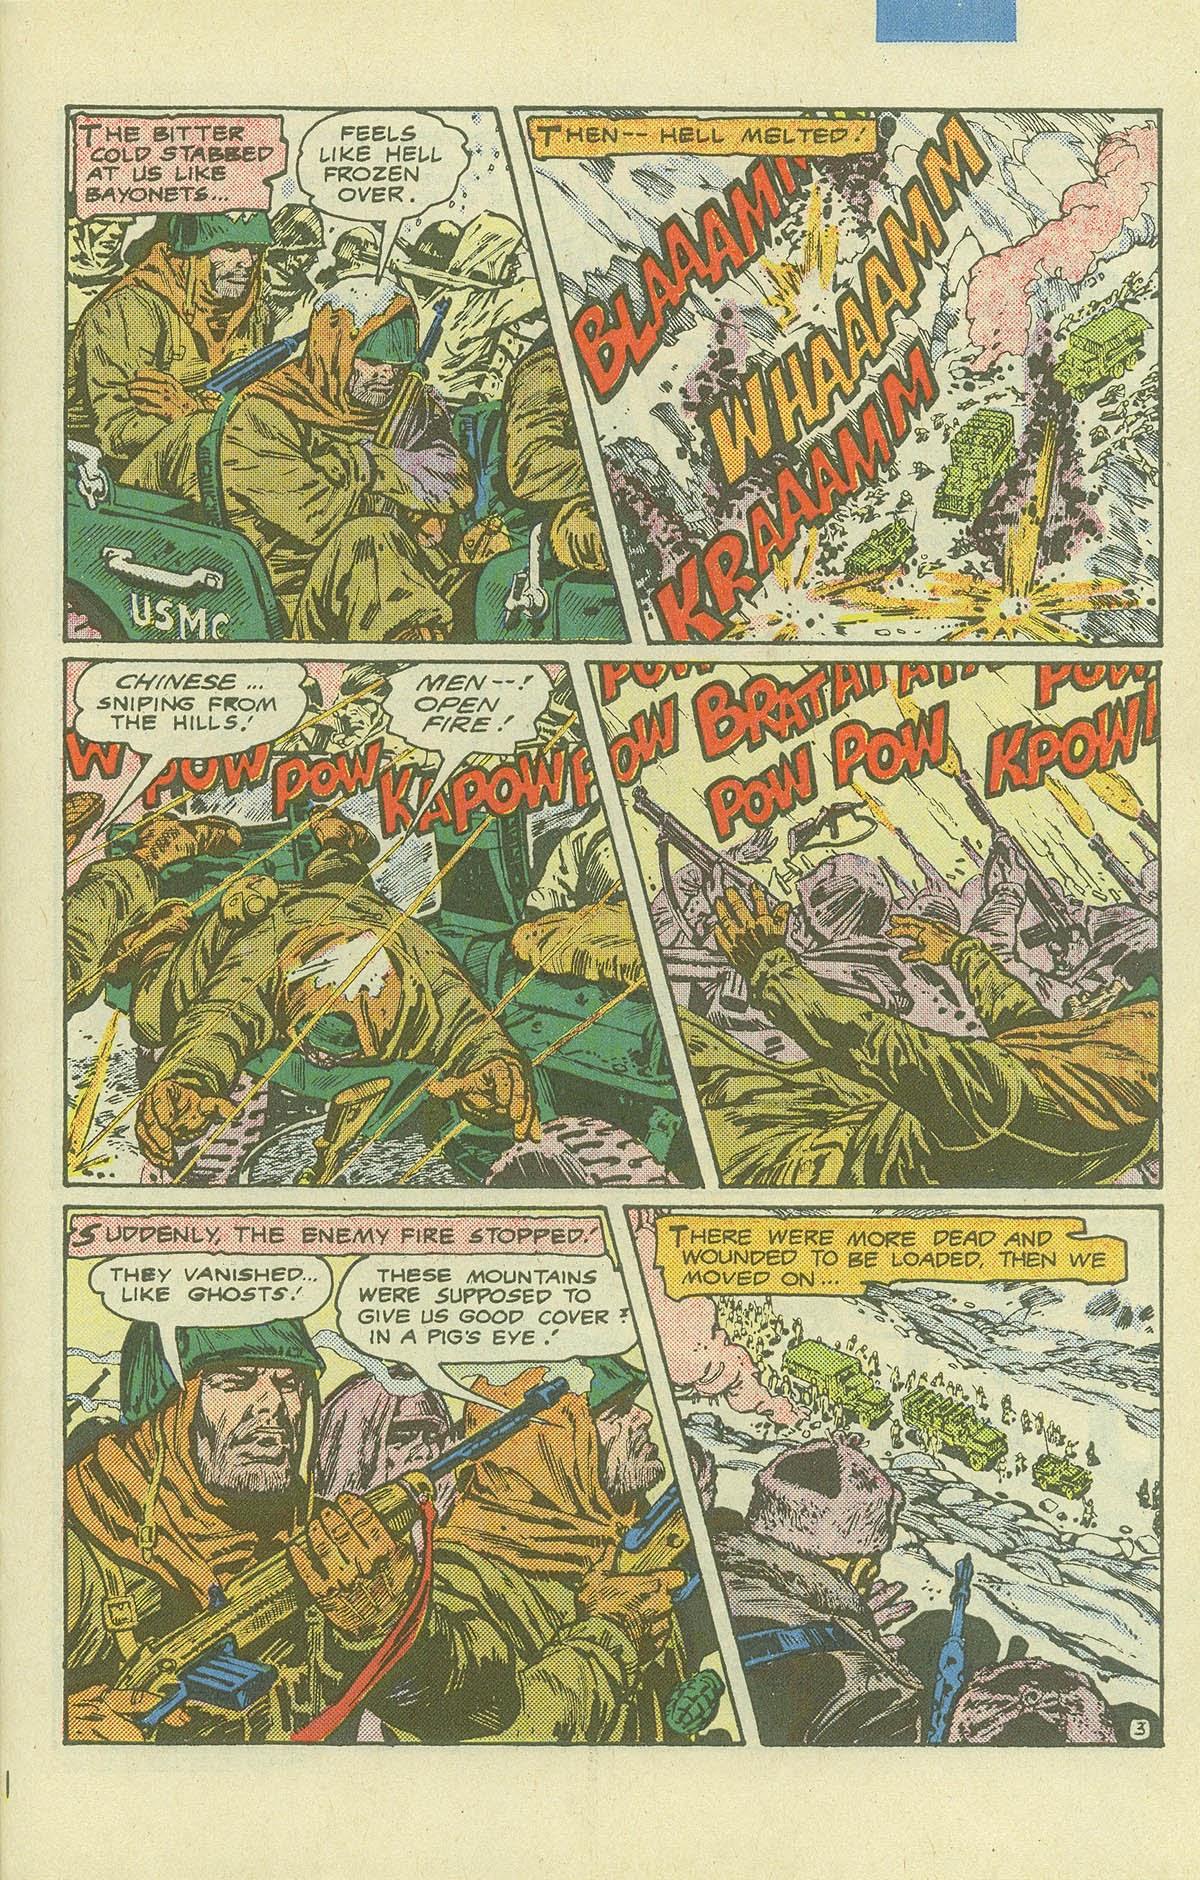 Read online Sgt. Rock comic -  Issue #411 - 26